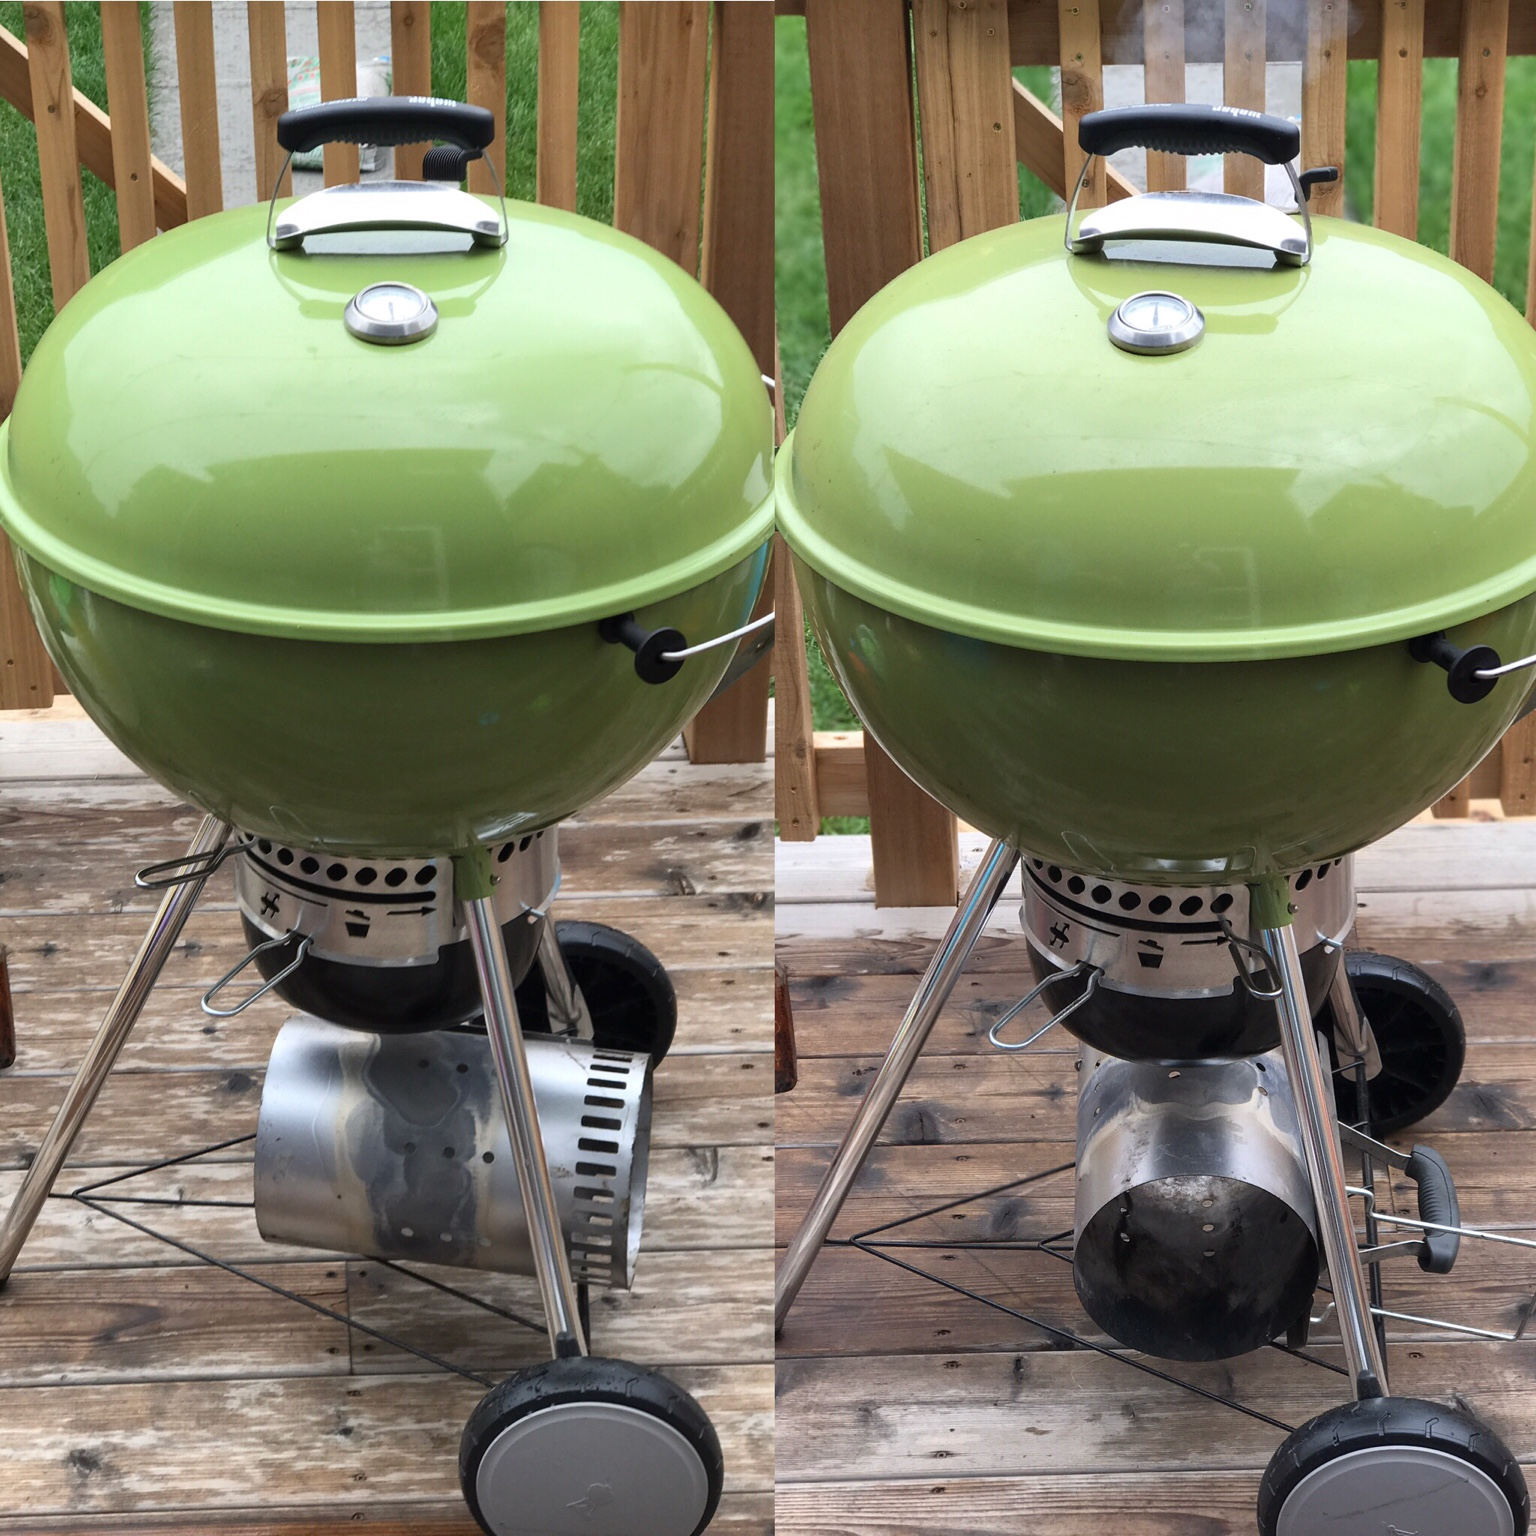 new spring green kettle: cold vs hot color change